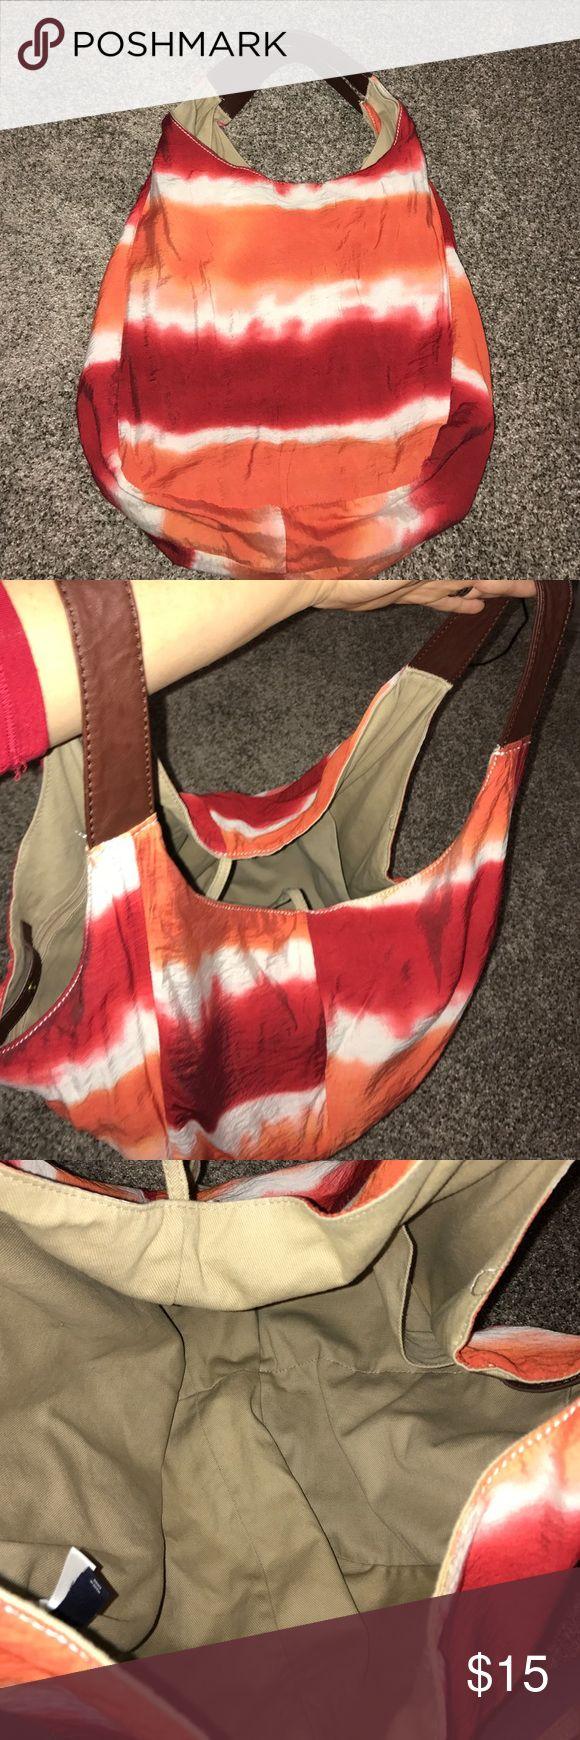 Gap tie dye oversized bag Super cute Gap over sized tie dye bag. Has orange, red, white tie dye design and beige lining with brown handles. GAP Bags Hobos